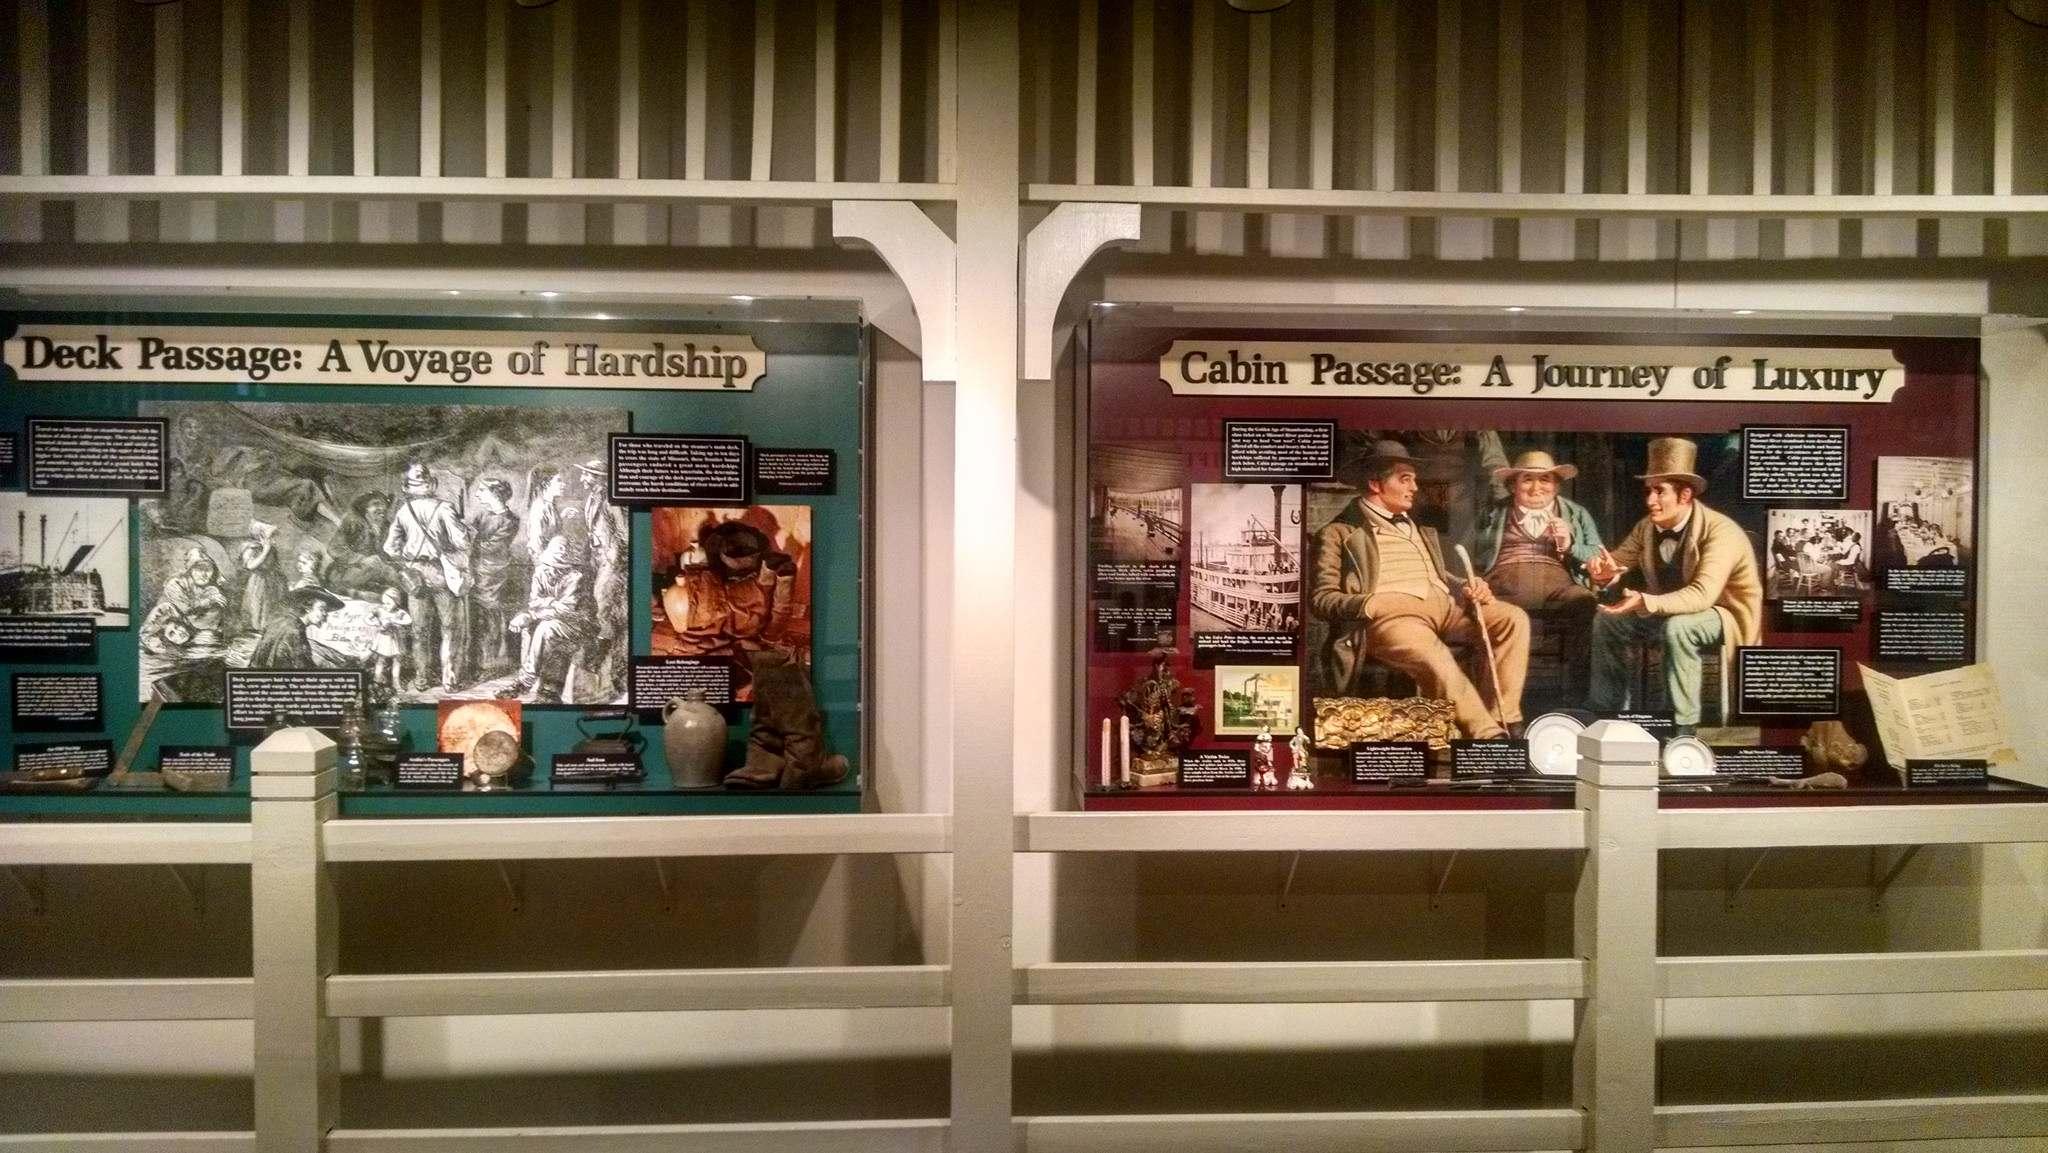 steamboat arabia10 History of Pioneering Midwest   Steamboat Arabia Museum in Kansas City